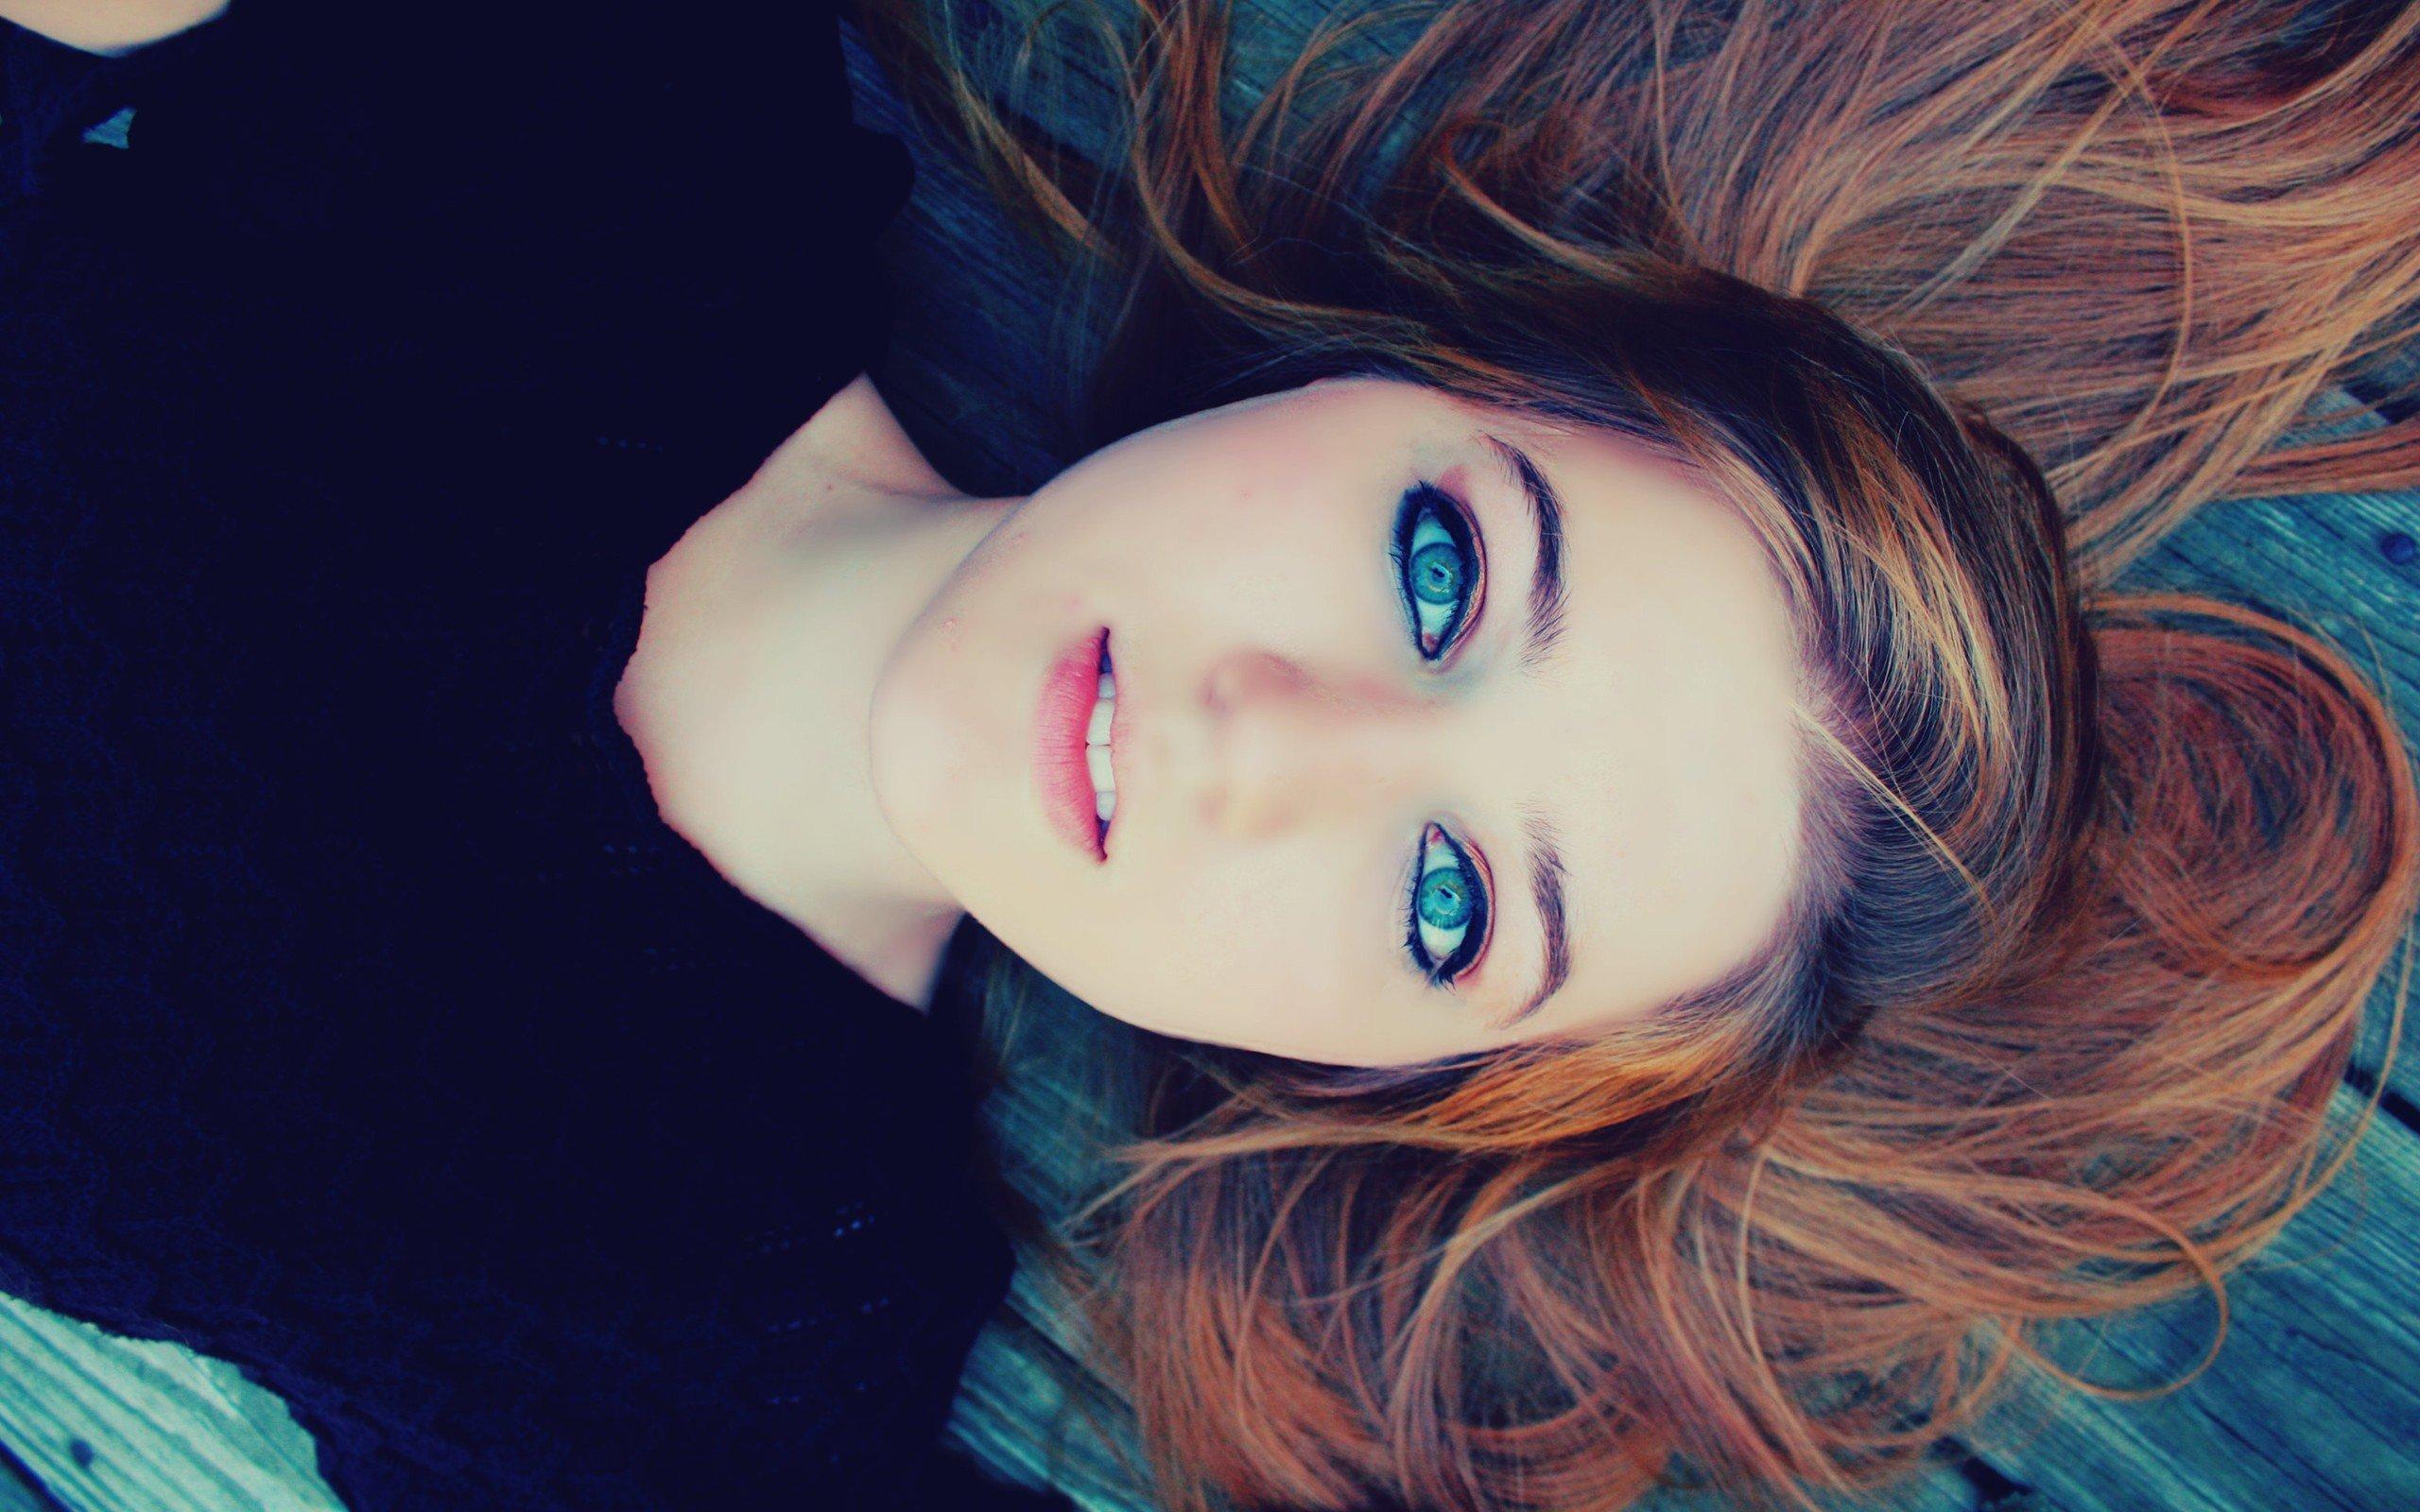 women, Face, Brunette, Blue eyes, Lying down Wallpaper